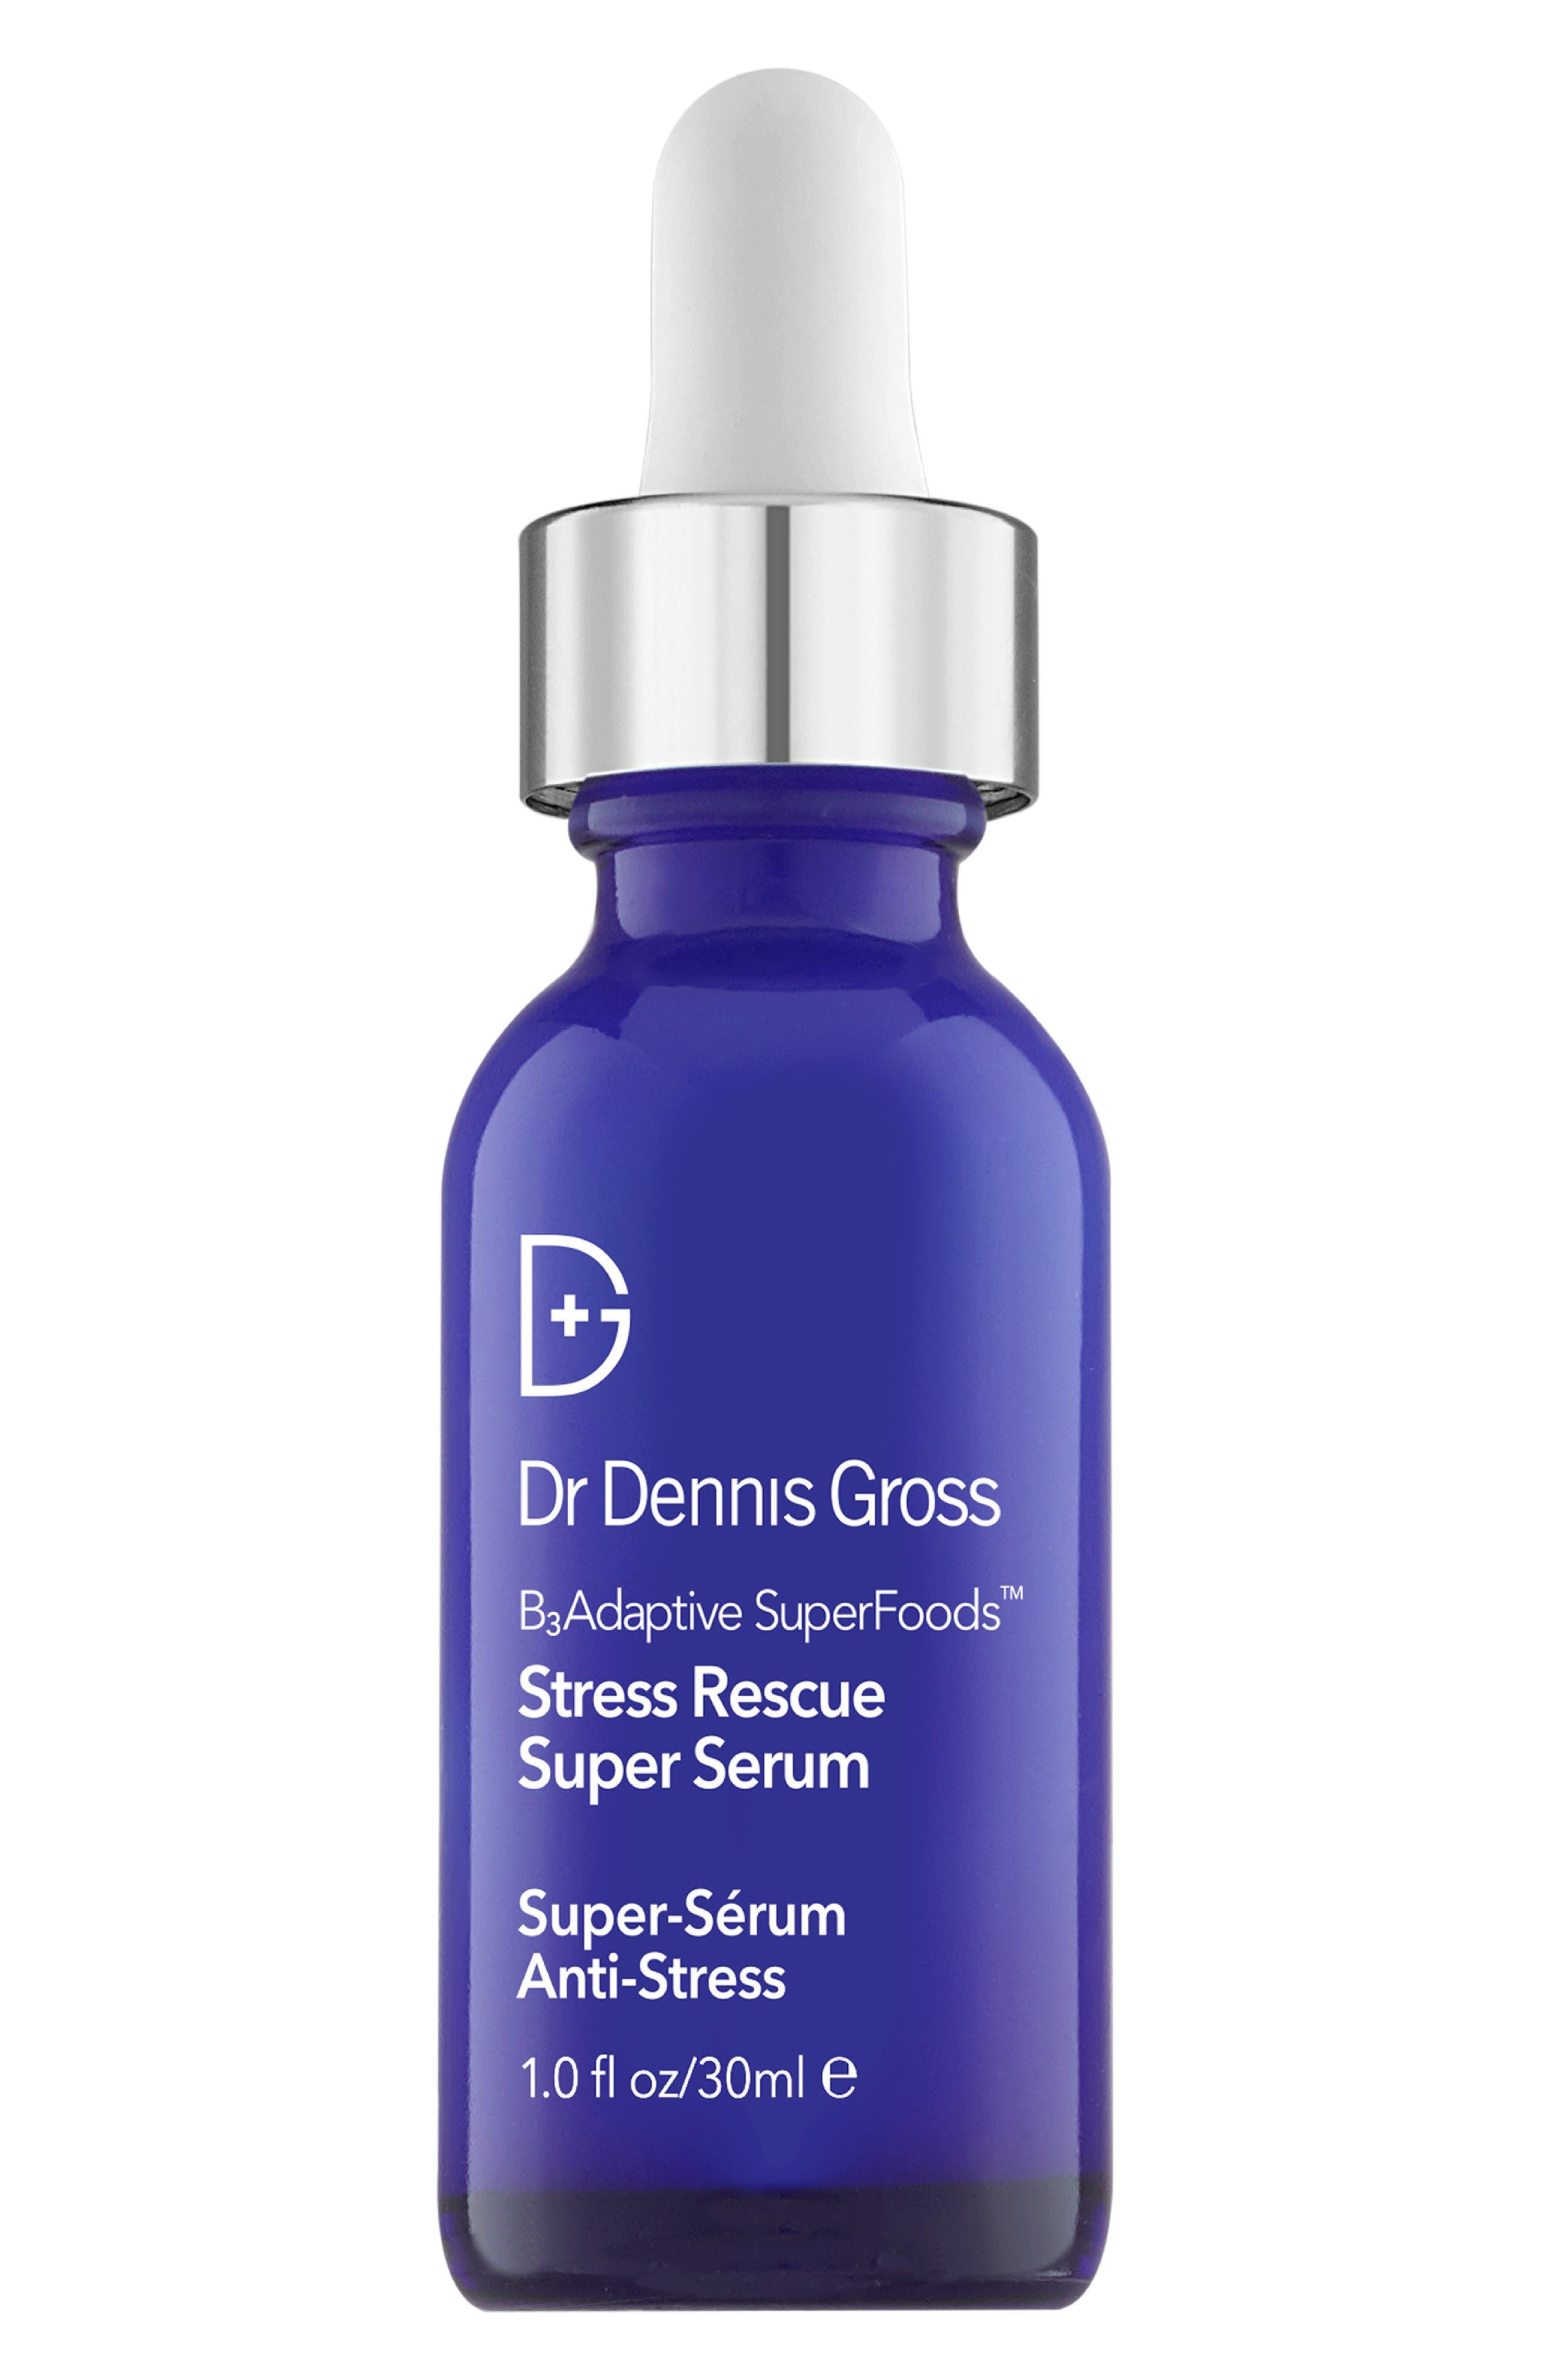 Skincare B3 Adaptive Superfoods(TM) Stress Rescue Super Serum